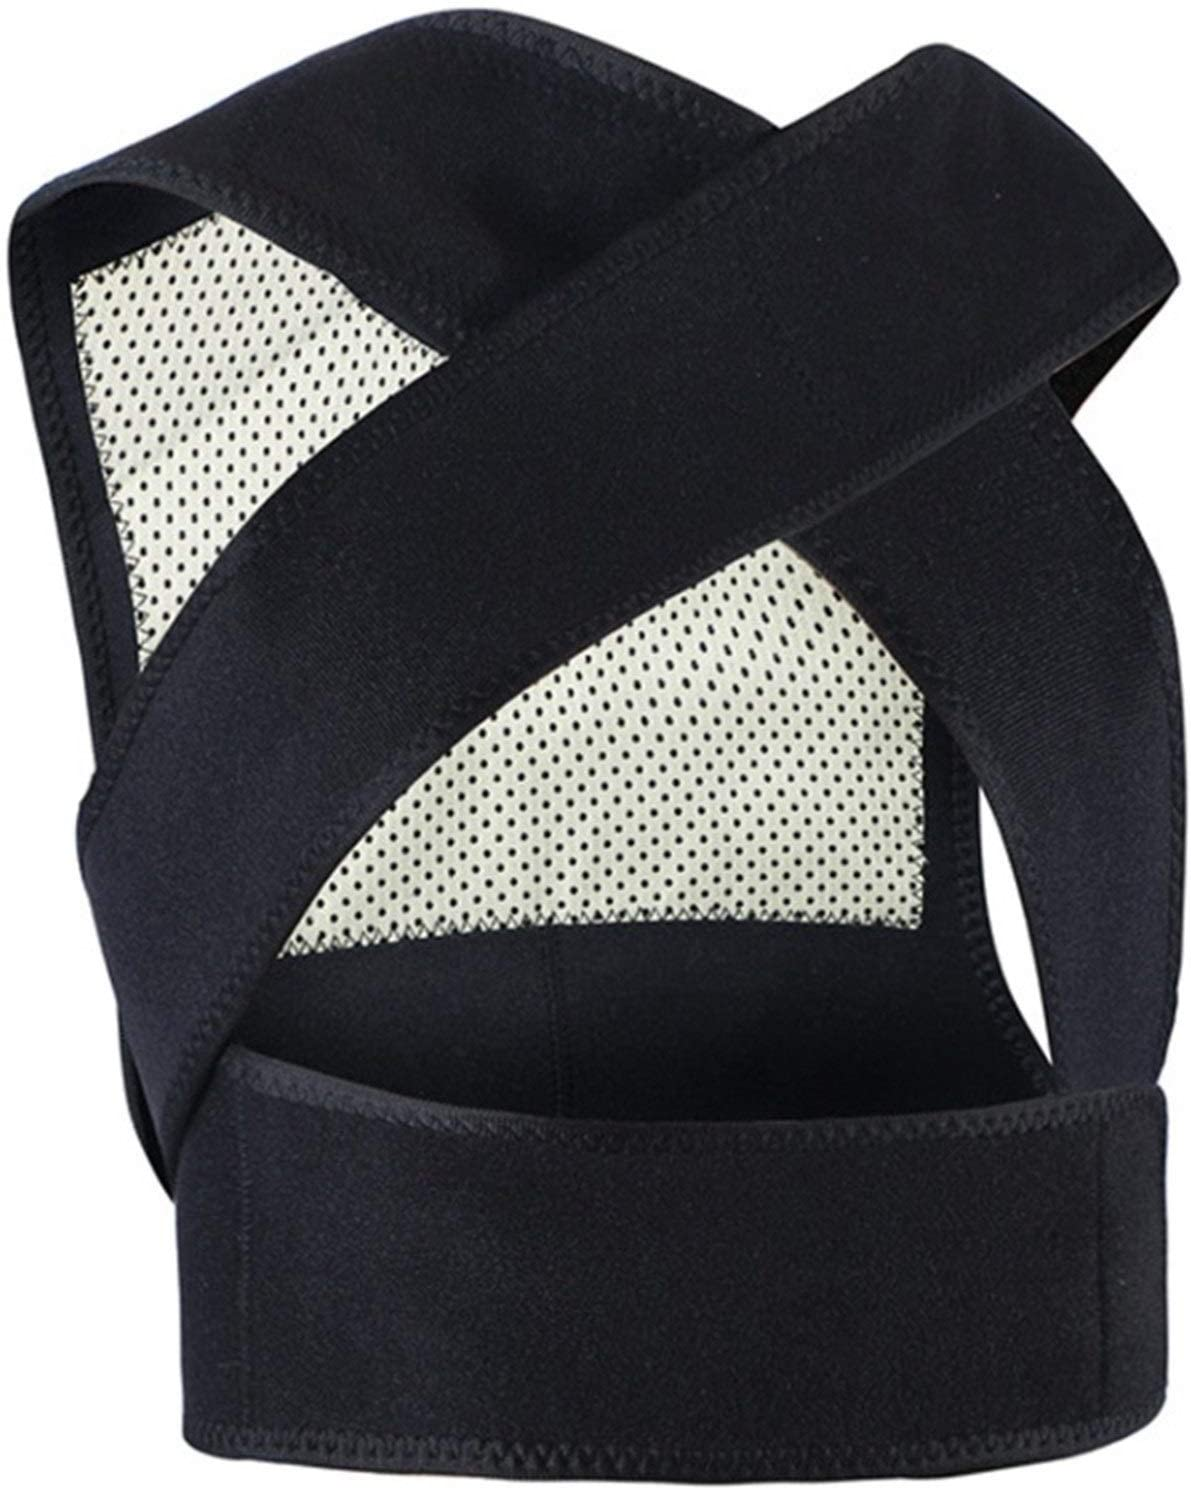 DSMYYXGS 1Pcs quality assurance Tourmaline Self-Heating Japan Maker New Belt Shoulde Support Brace